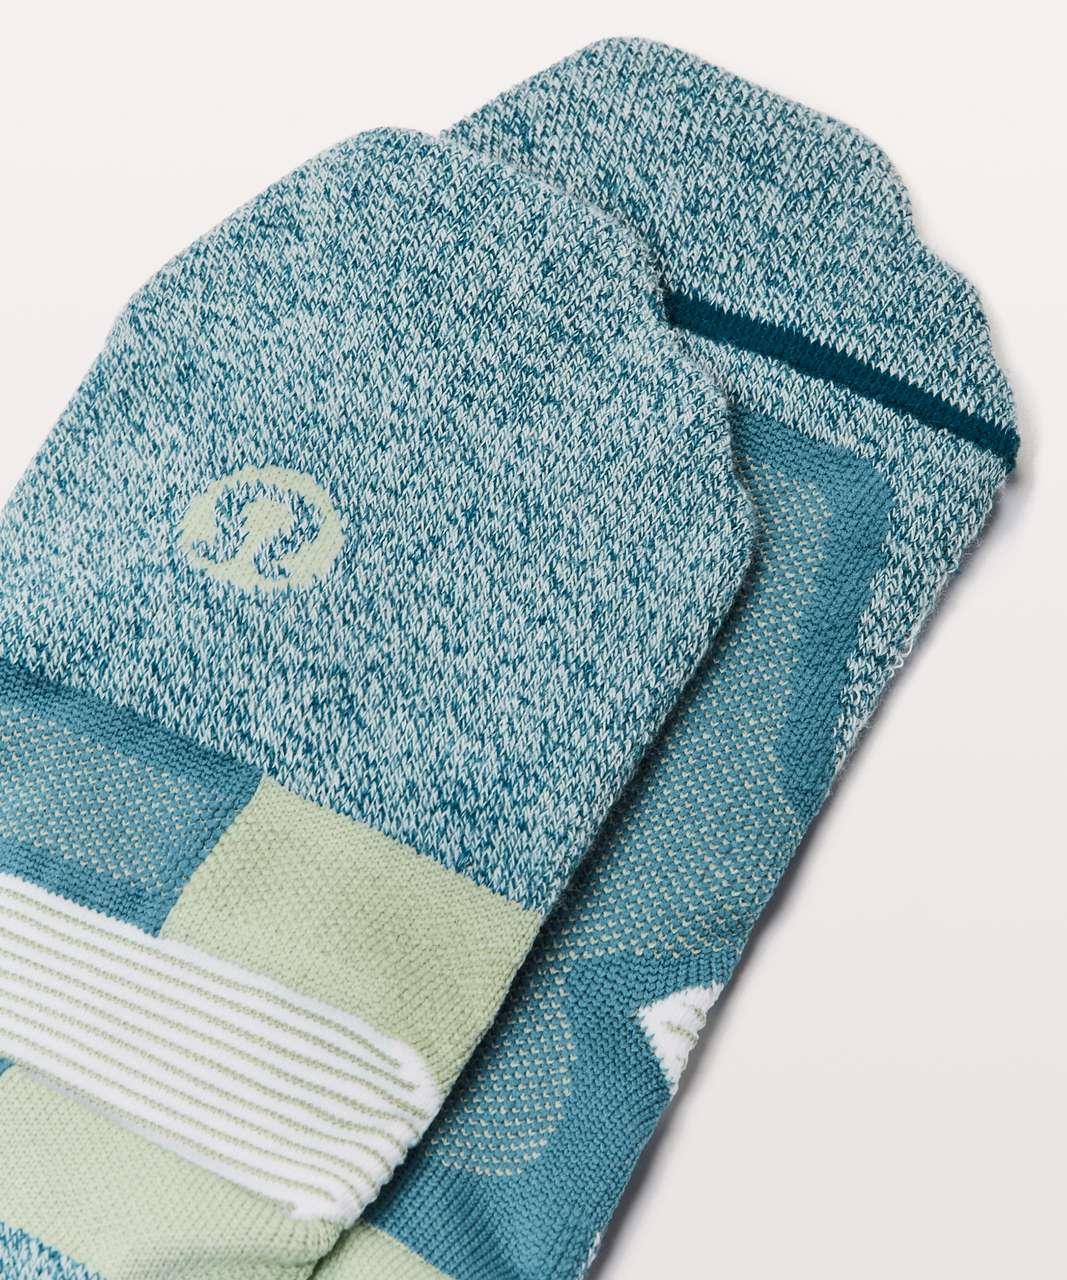 Lululemon Speed Sock *Silver - Julep / Persian Blue / White